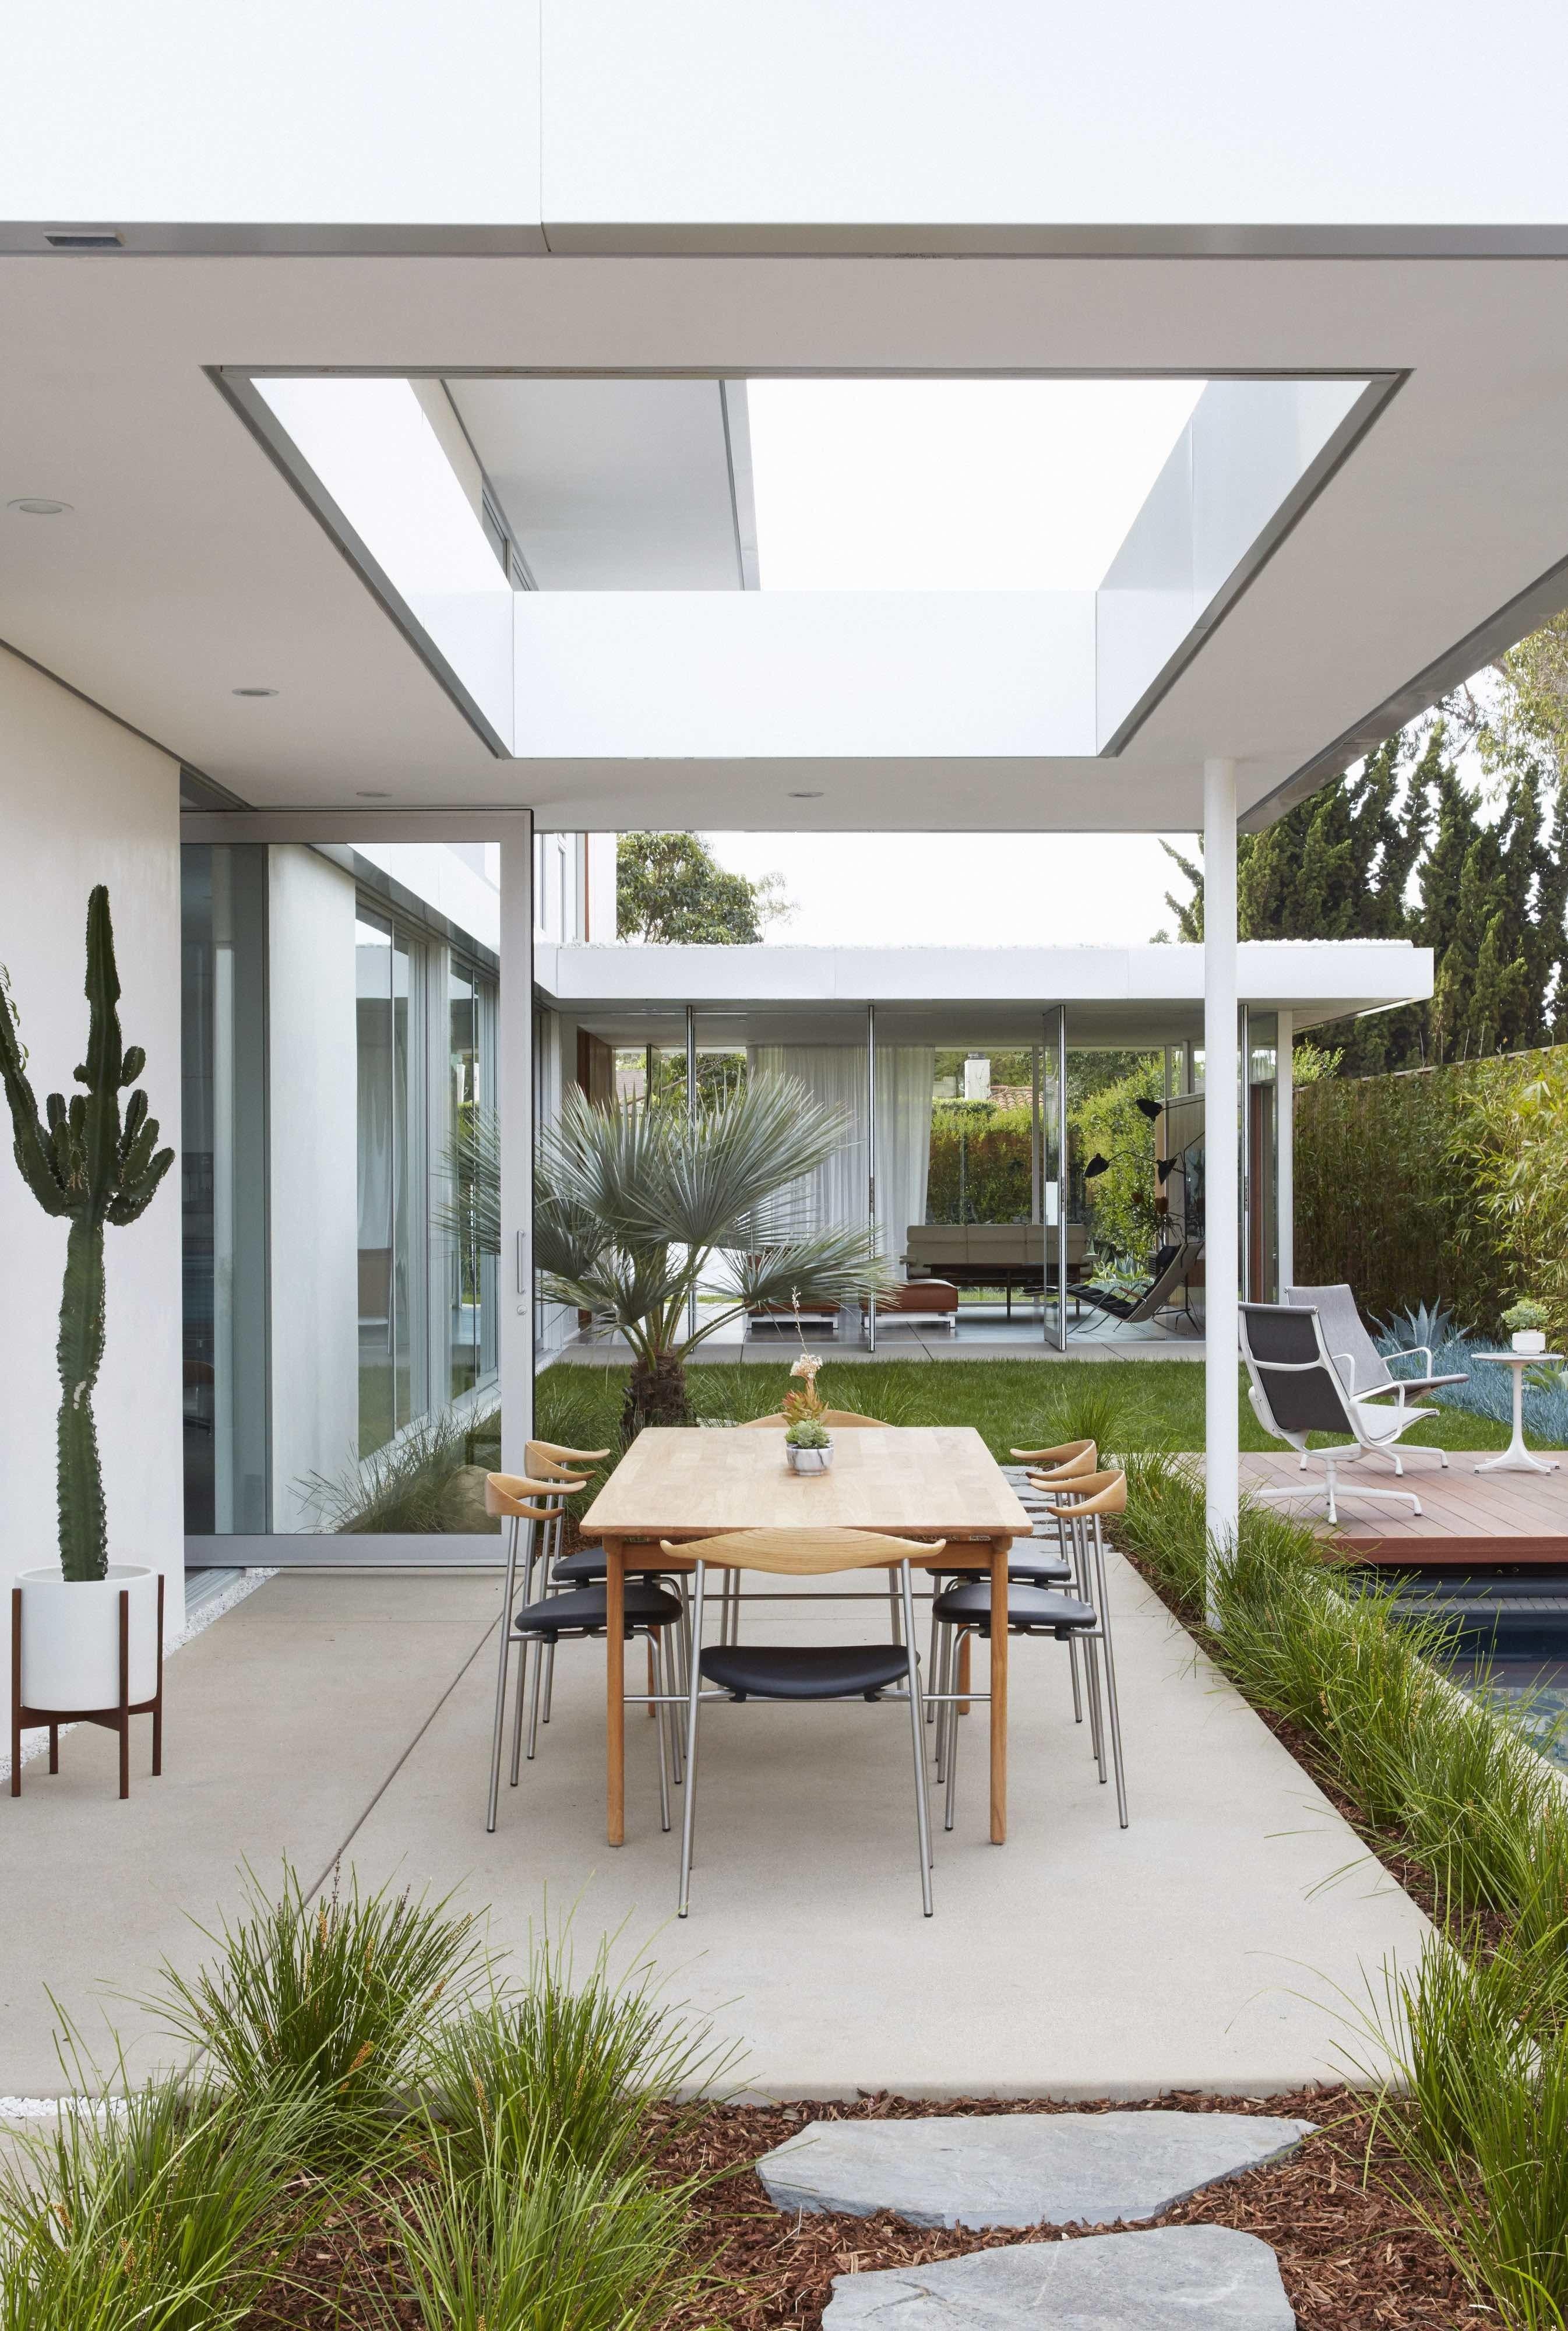 Santa monica residence modern home in santa monica california